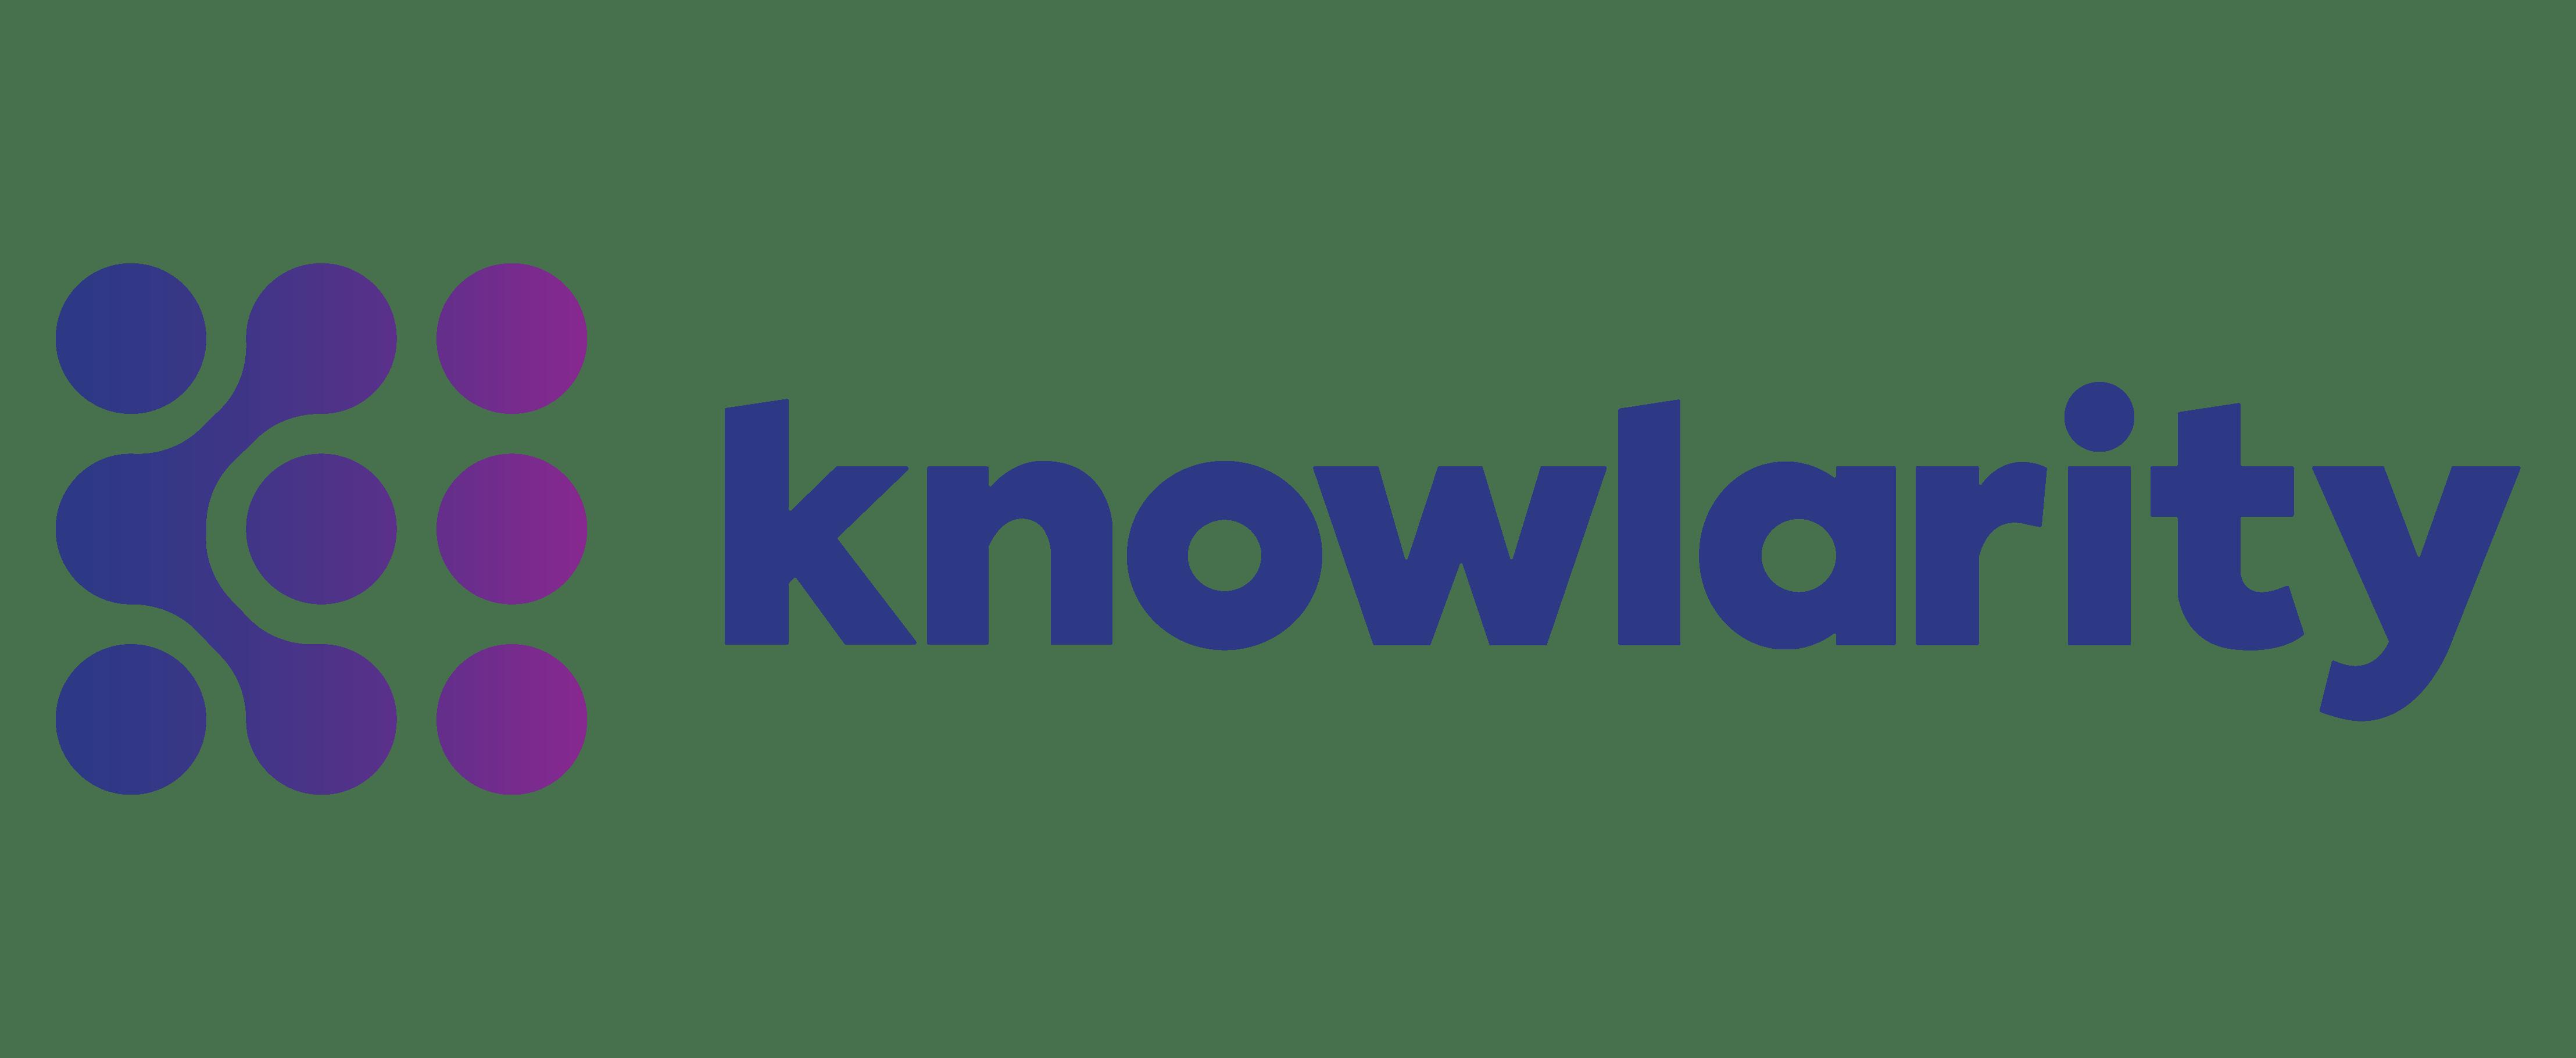 knowlarity logo 1